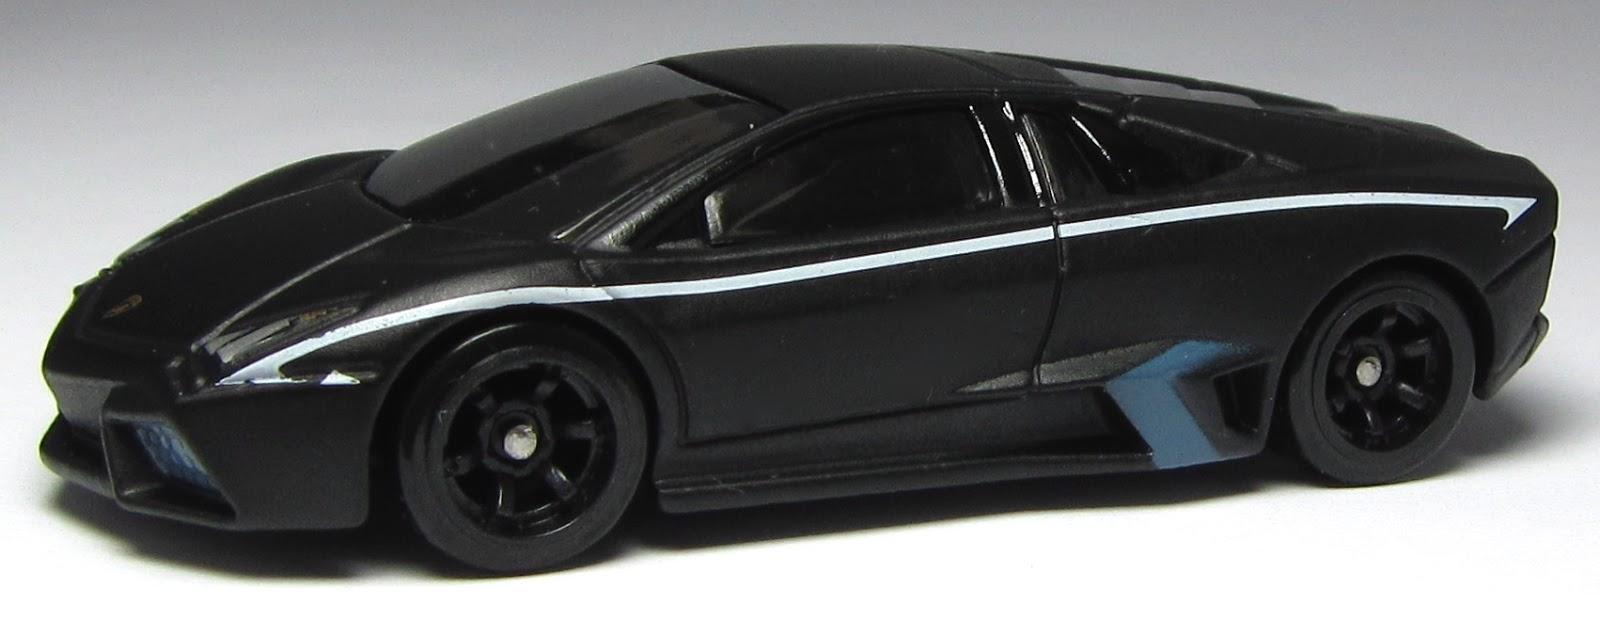 Models Of The Day Hot Wheels Speed Machines Lamborghini Reventon